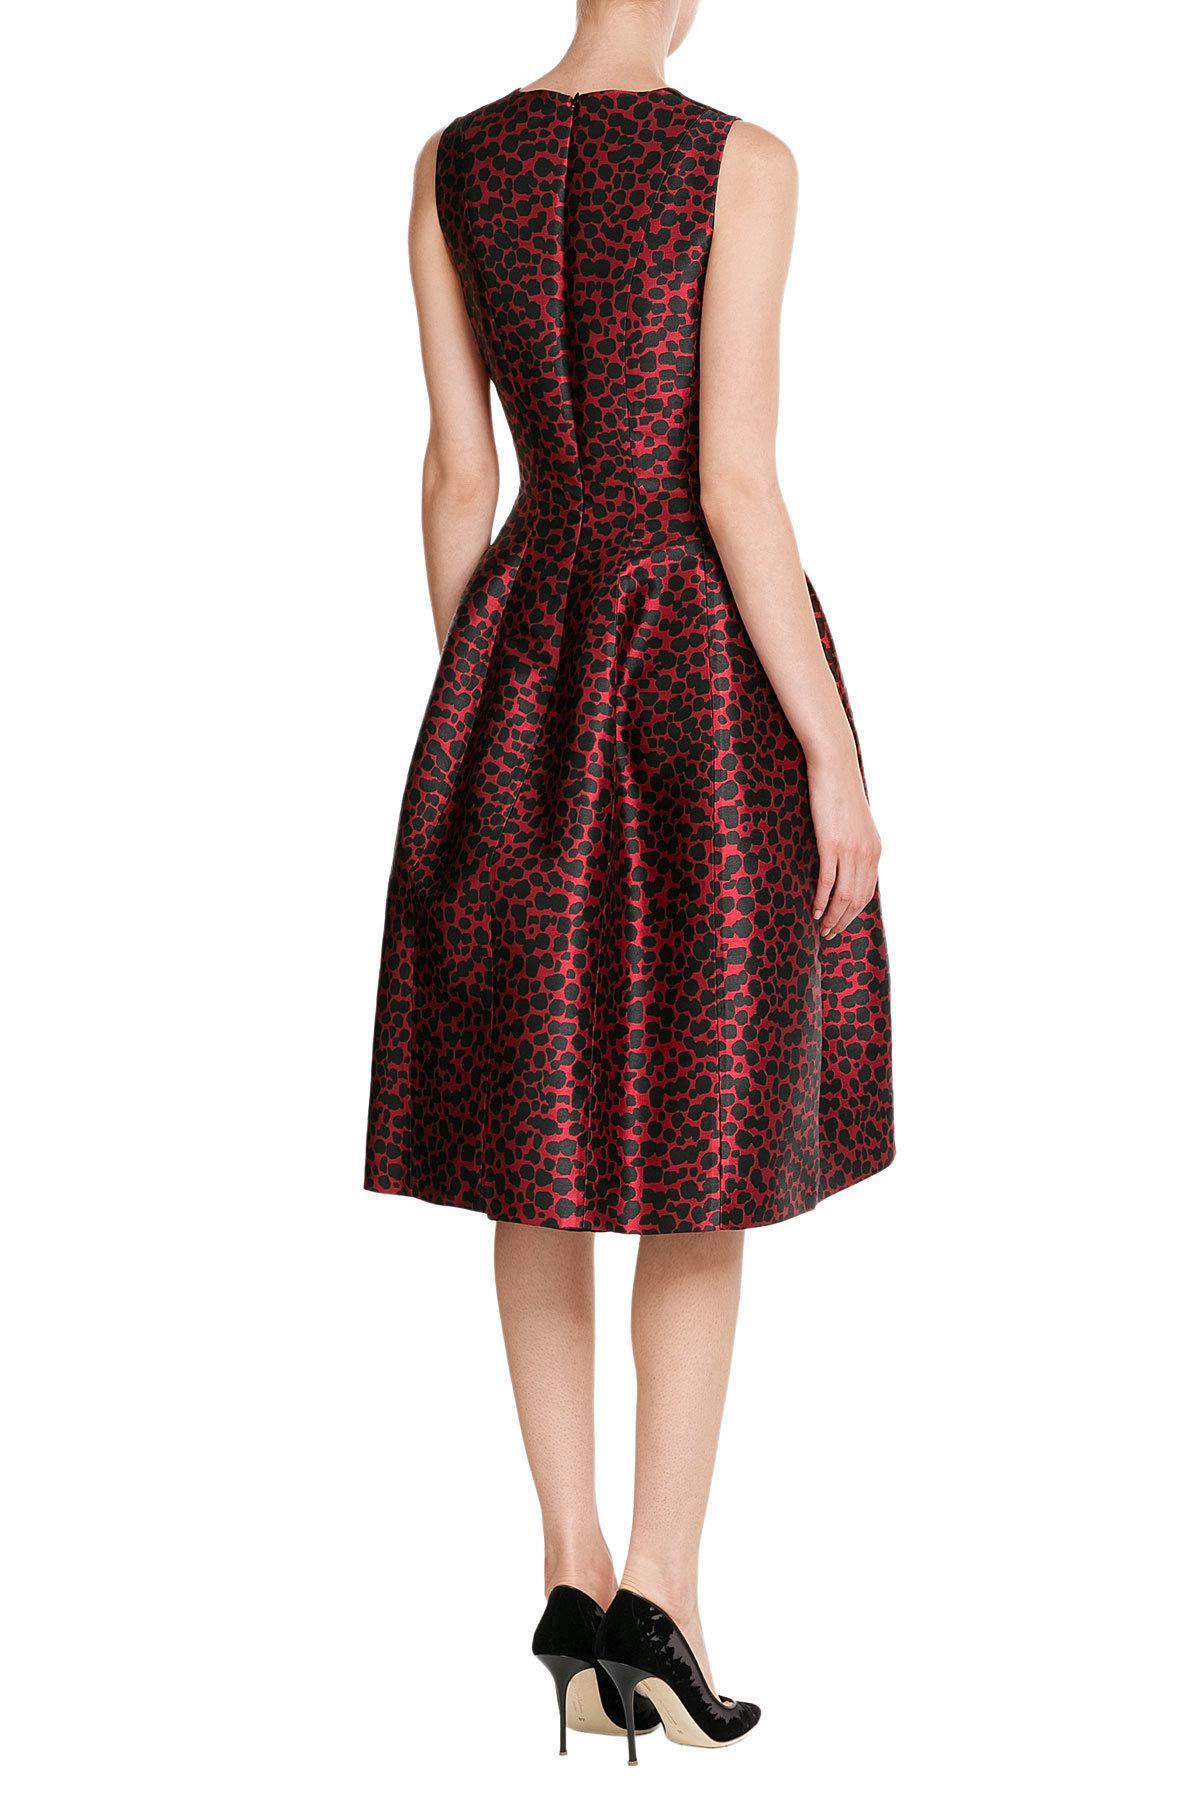 Lyst Michael Kors Printed Jacquard Dress in Red